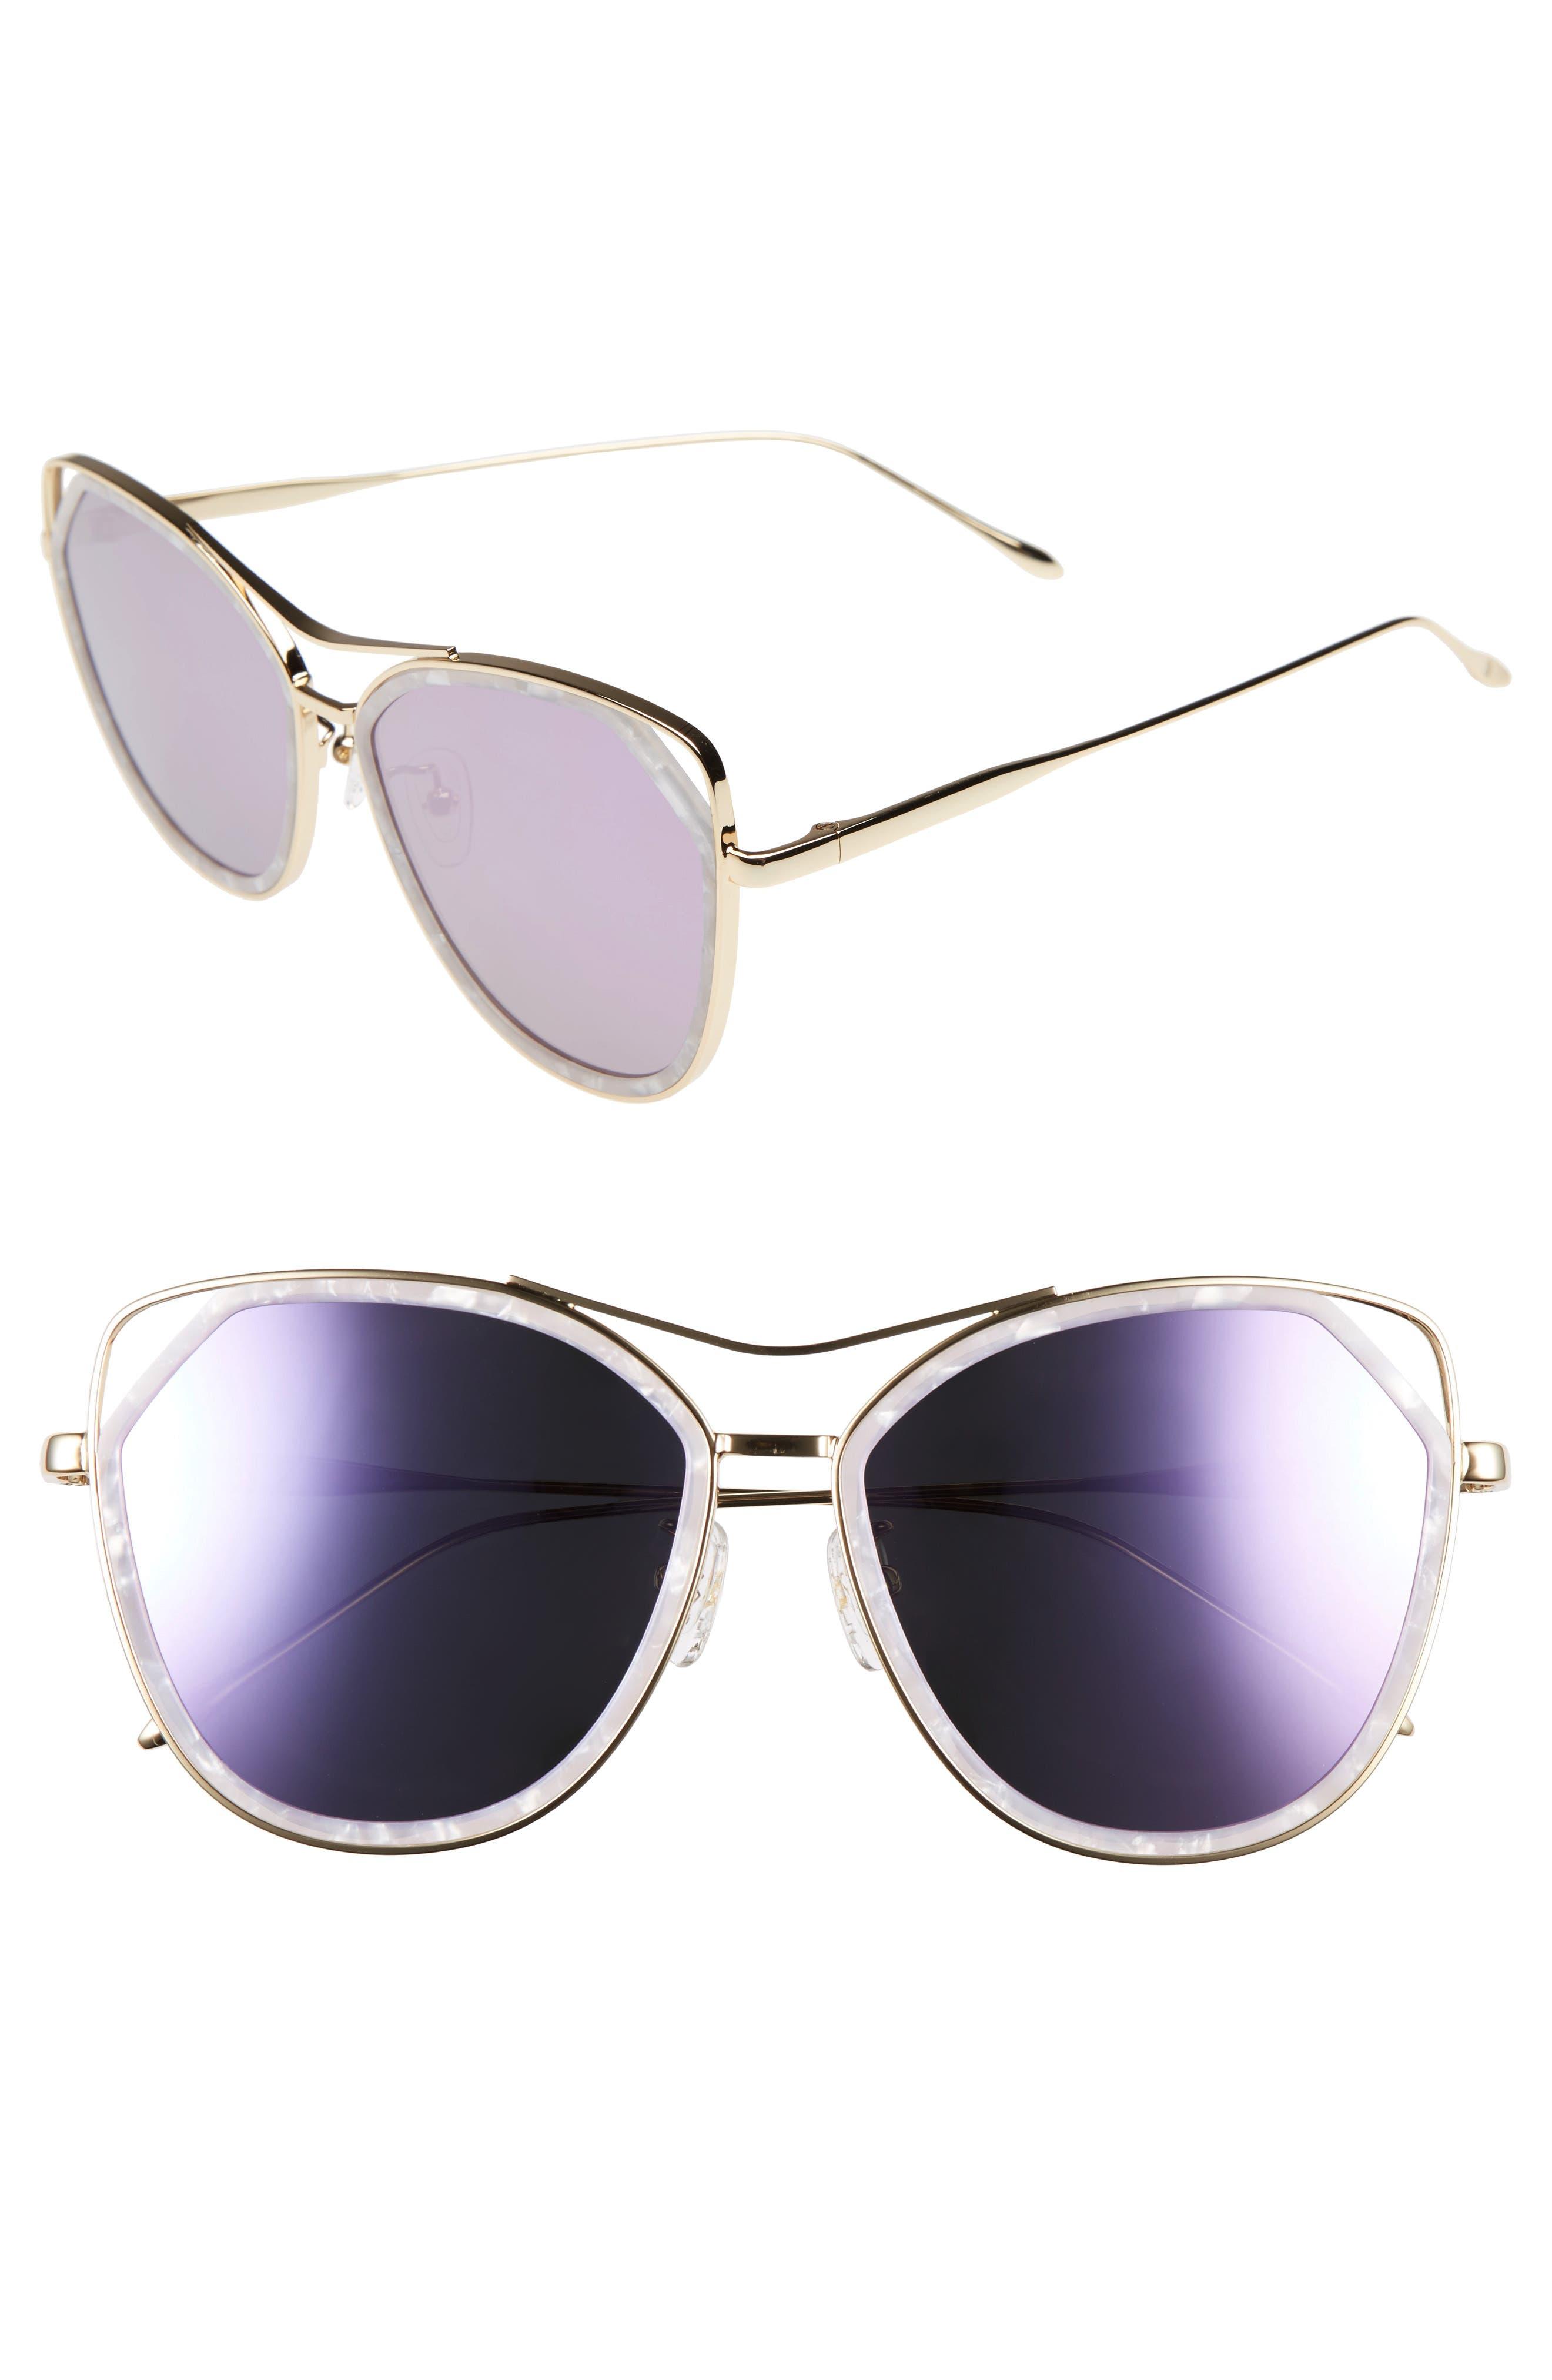 Main Image - Bonnie Clyde Grand 56mm Polarized Cat Eye Sunglasses